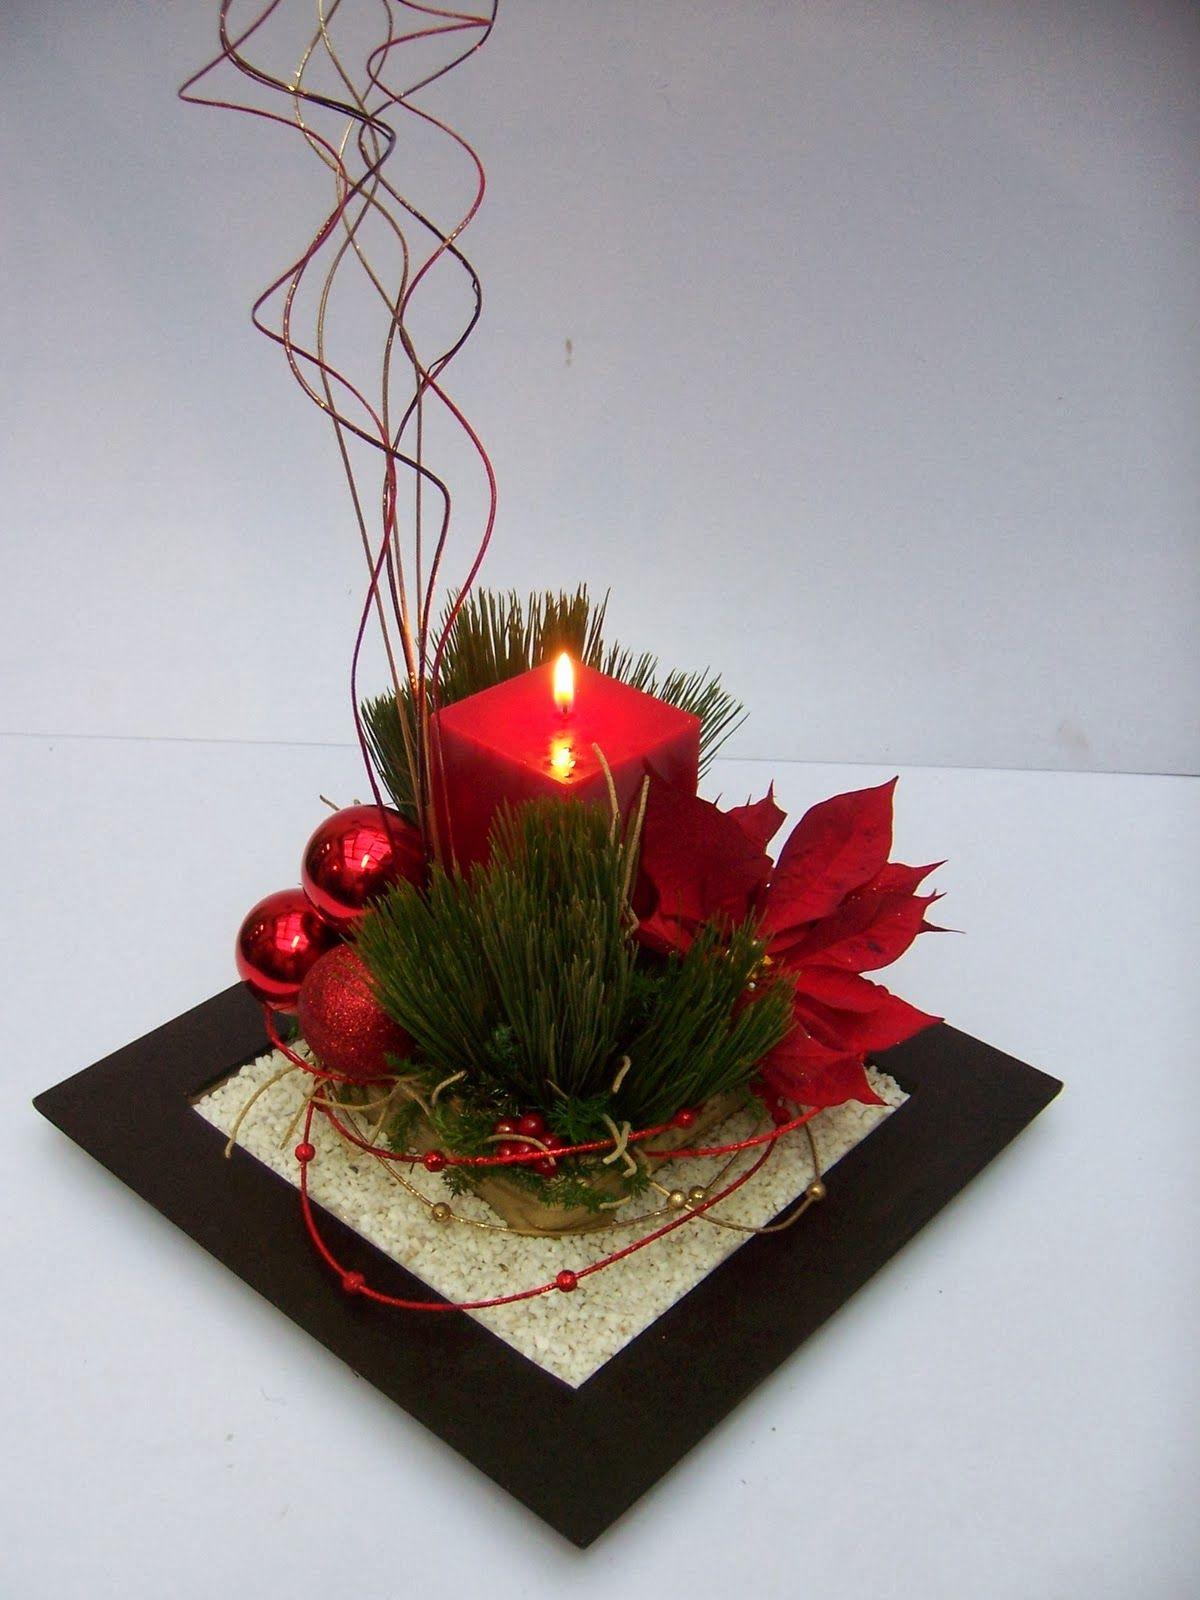 Centros de mesa navide os buscar con google decoraci n for Adornos originales para navidad